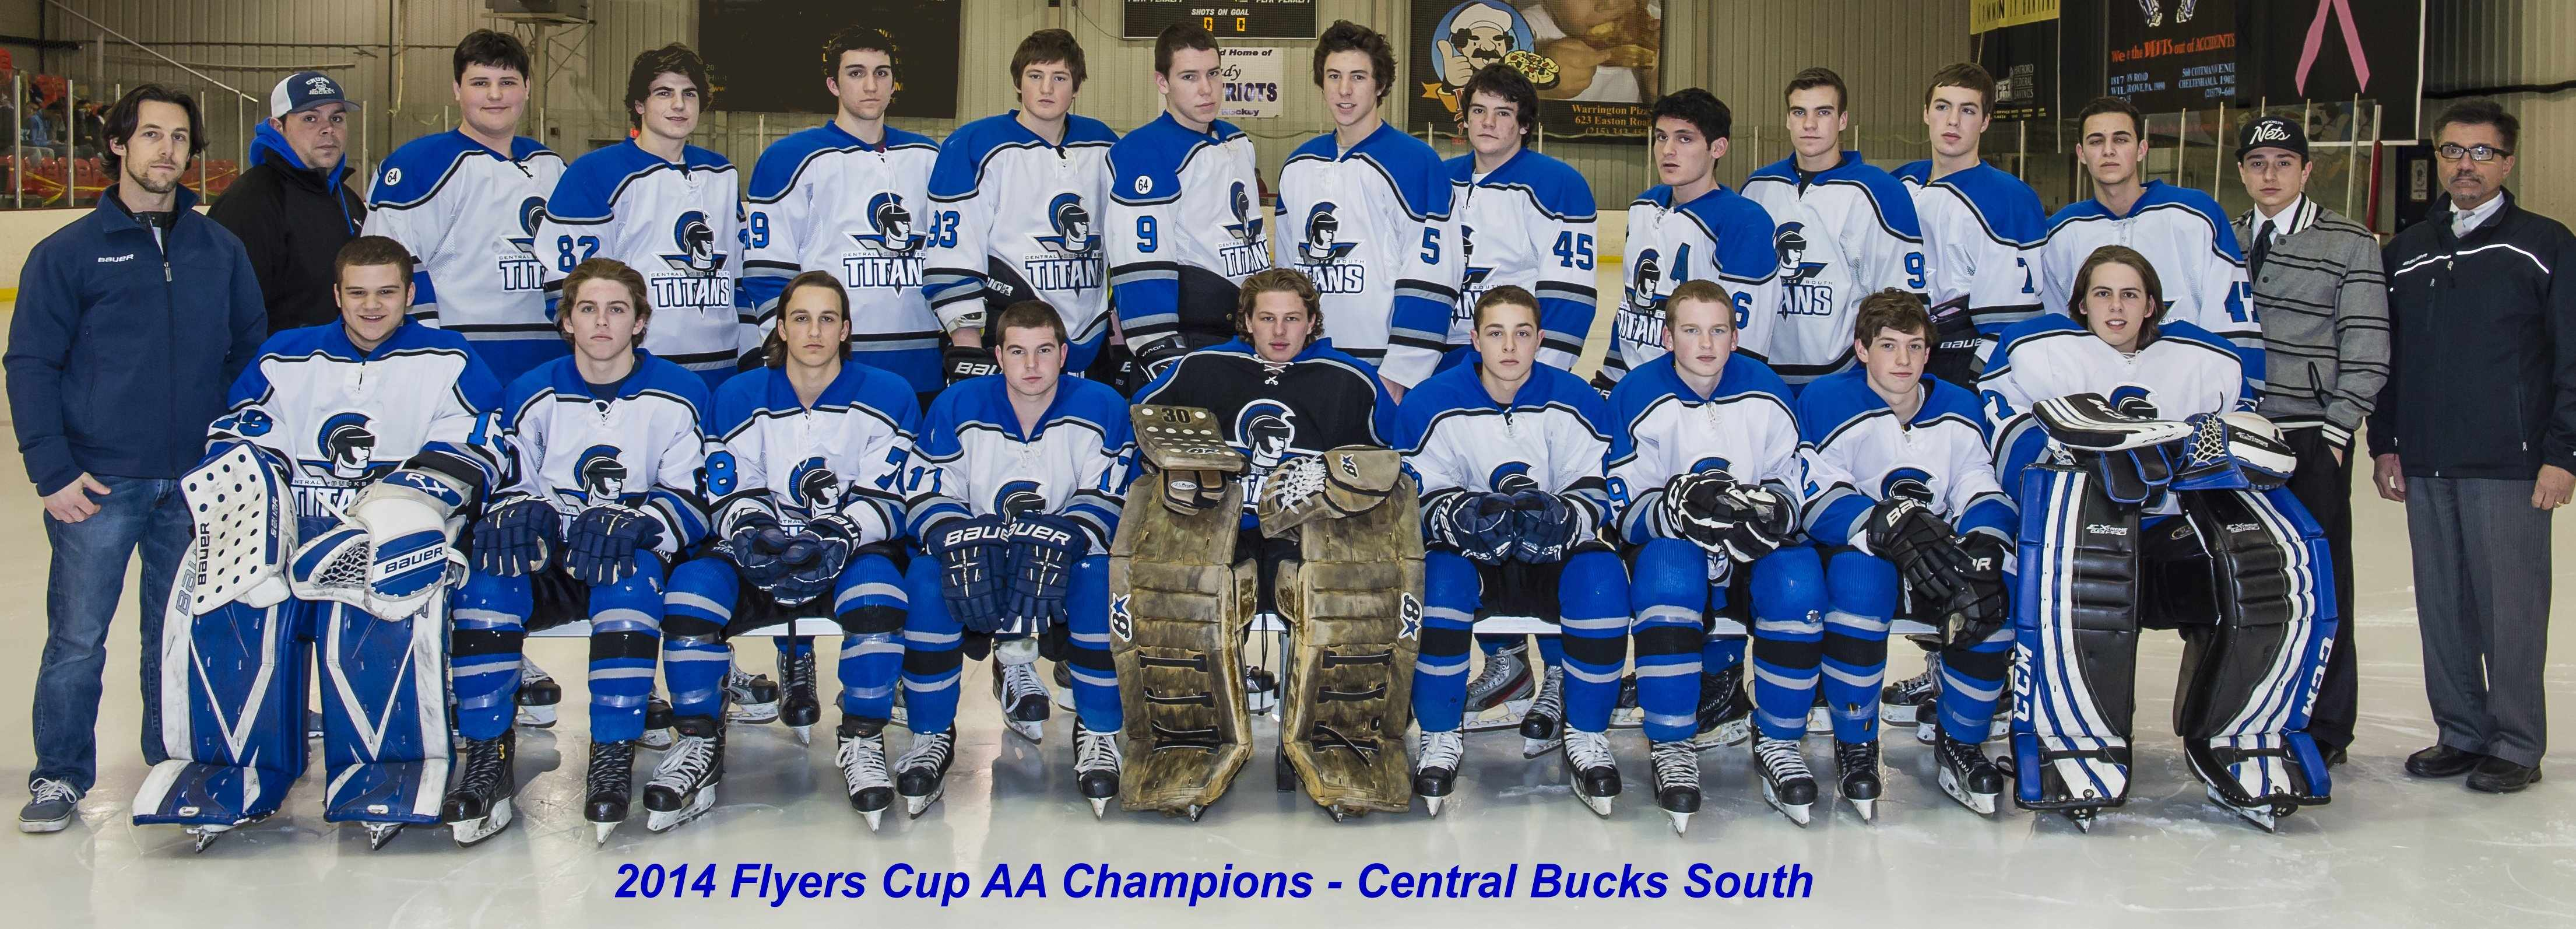 2014 Central Bucks South Titans